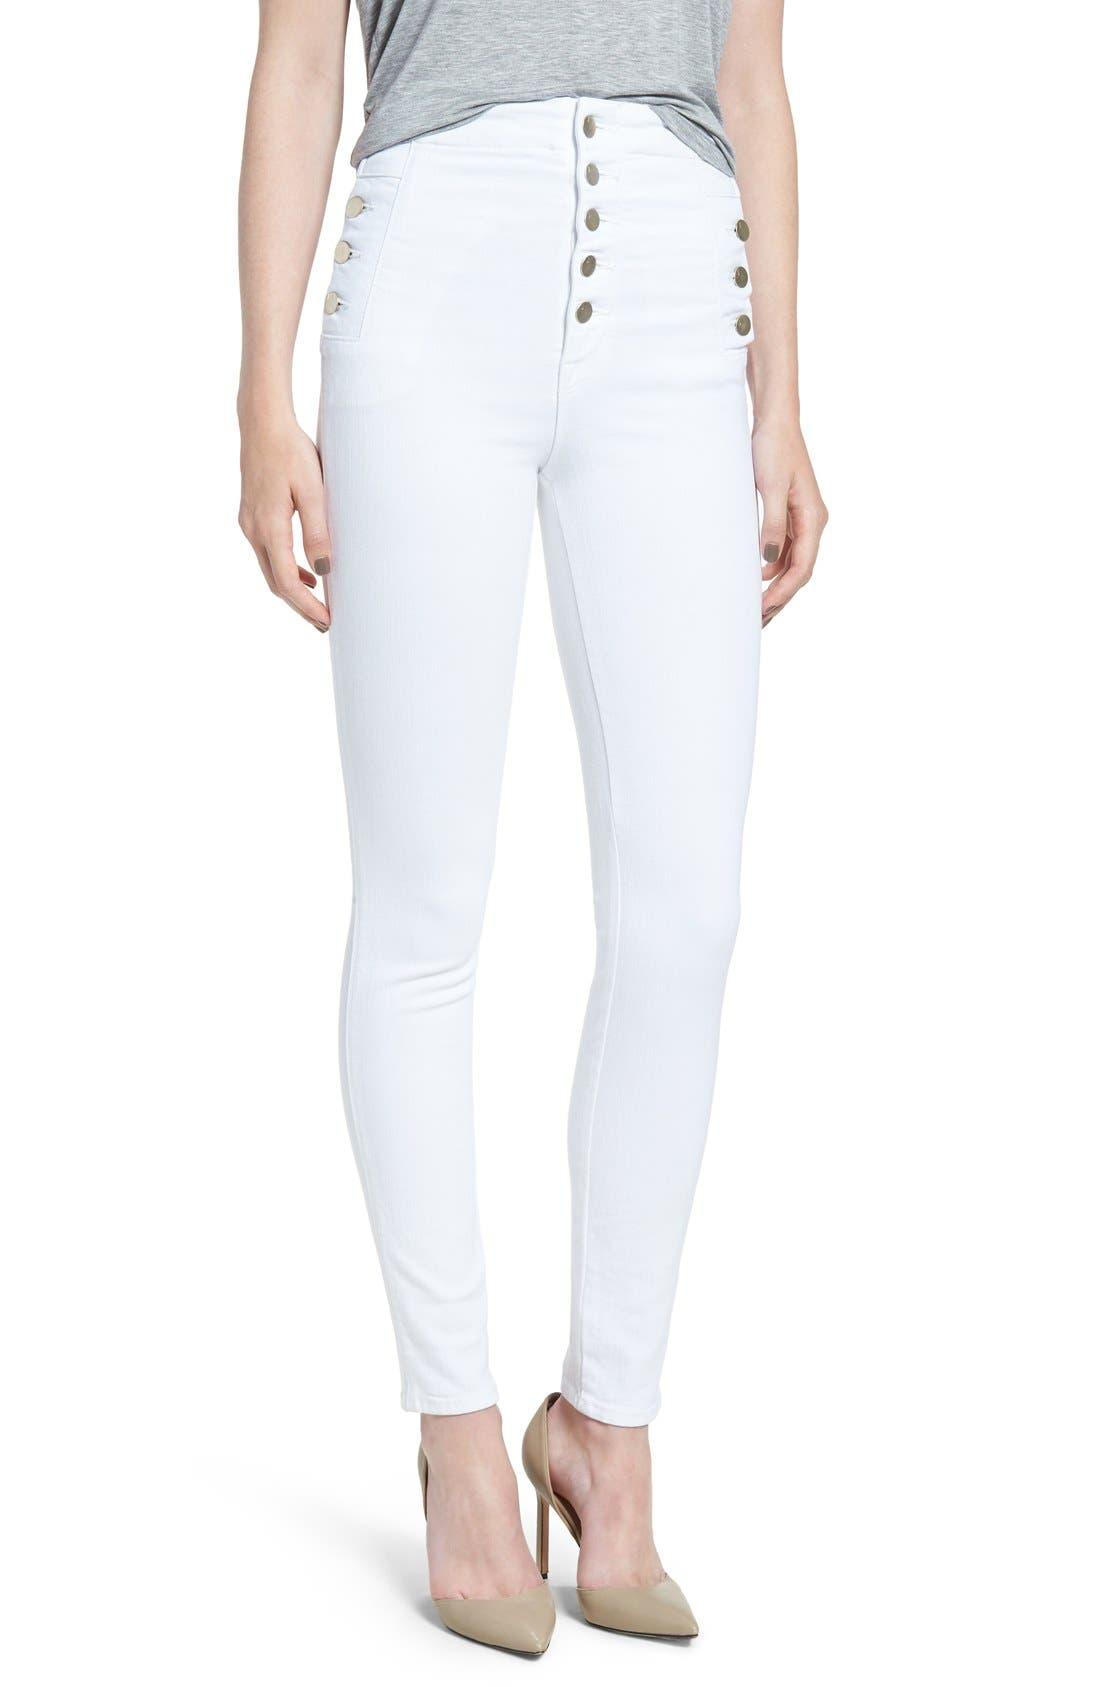 J BRAND Natasha Sky High High Rise Skinny Jeans